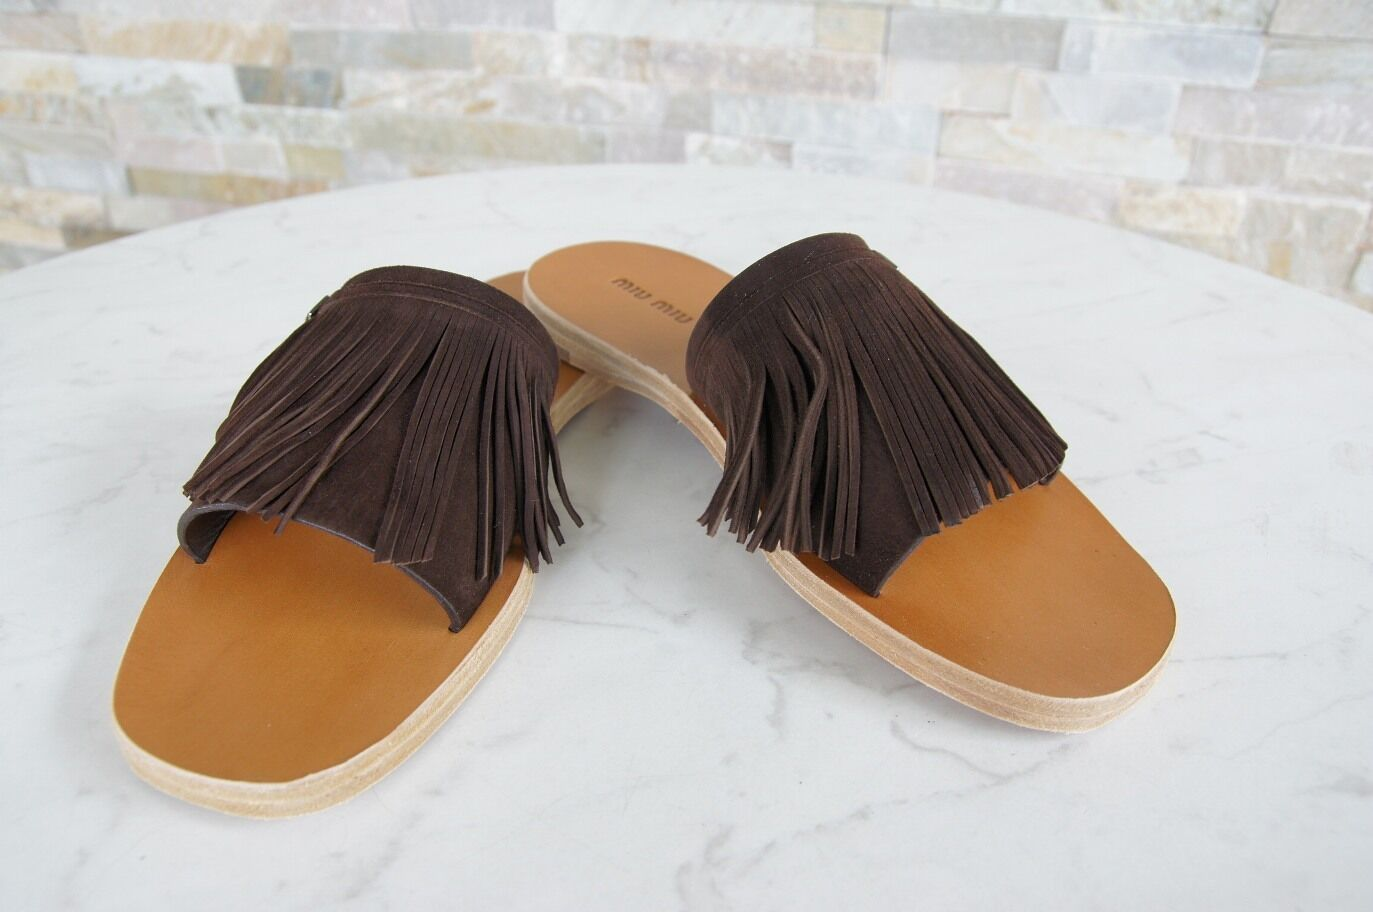 Miu Miu Miu Miu Size 38 Backless Sandals Sandals Slippers shoes Teak New Previously ace6e1